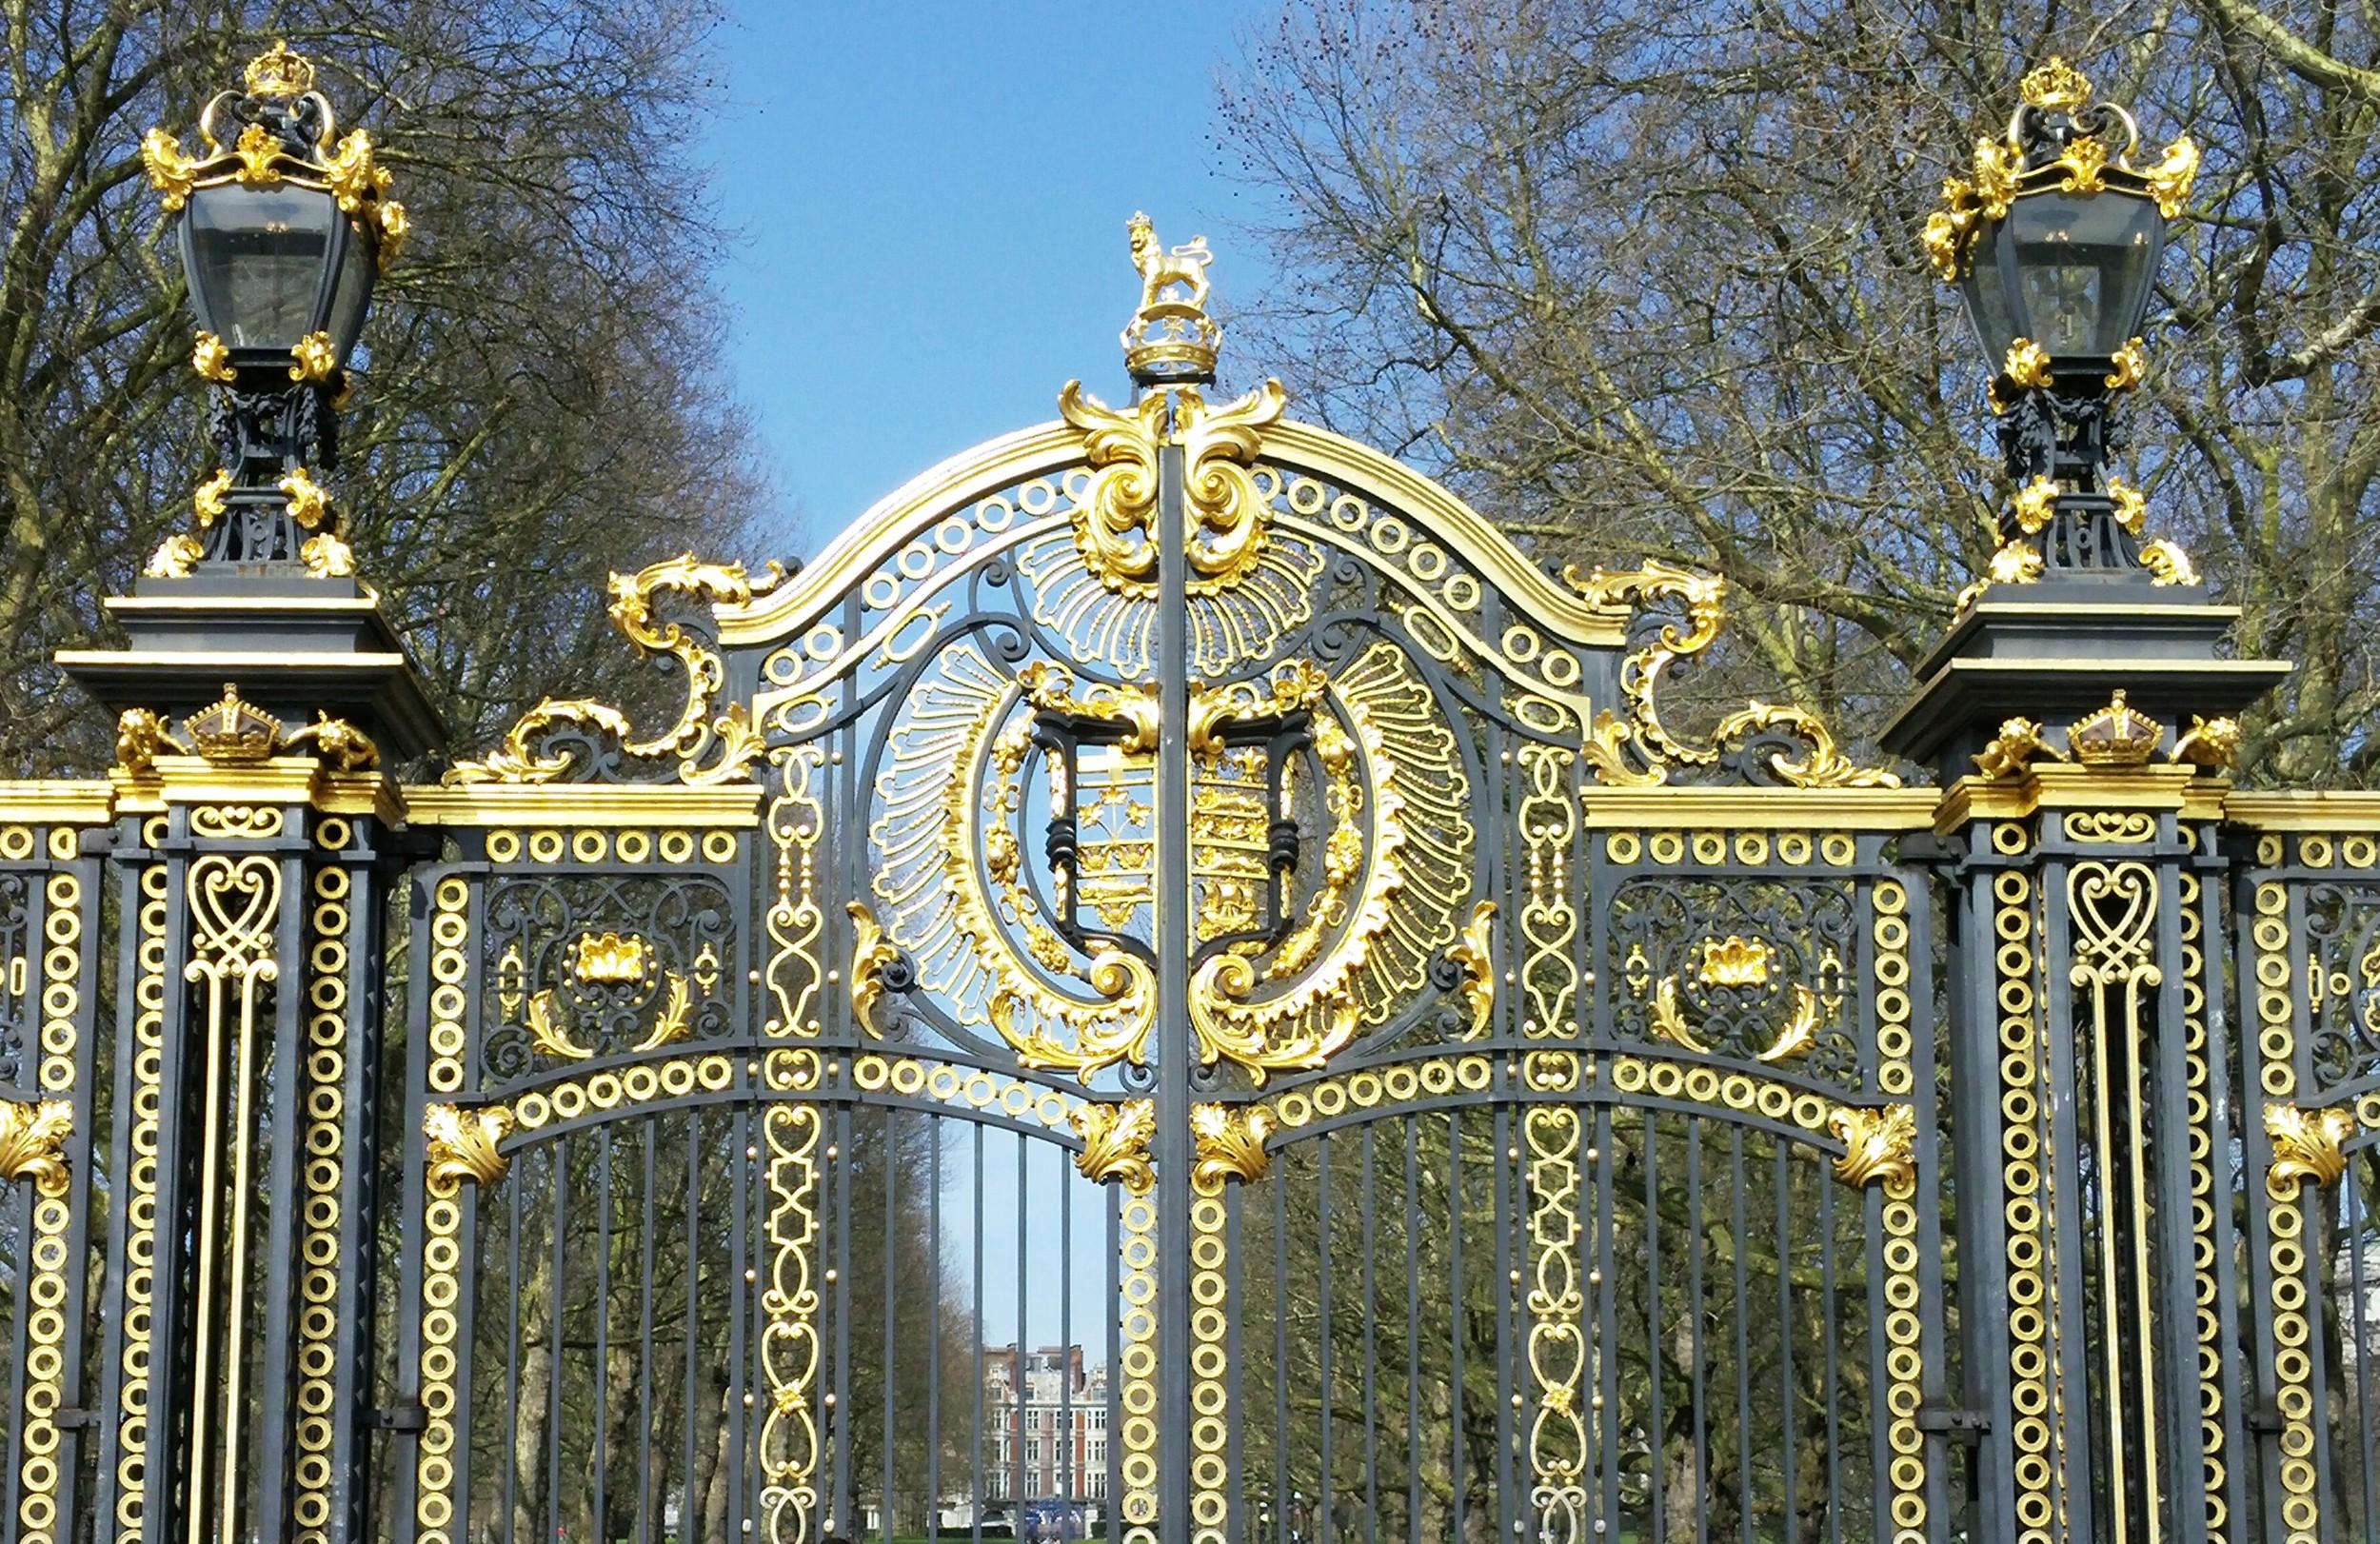 The Canada Gates at Buckingham Palace.